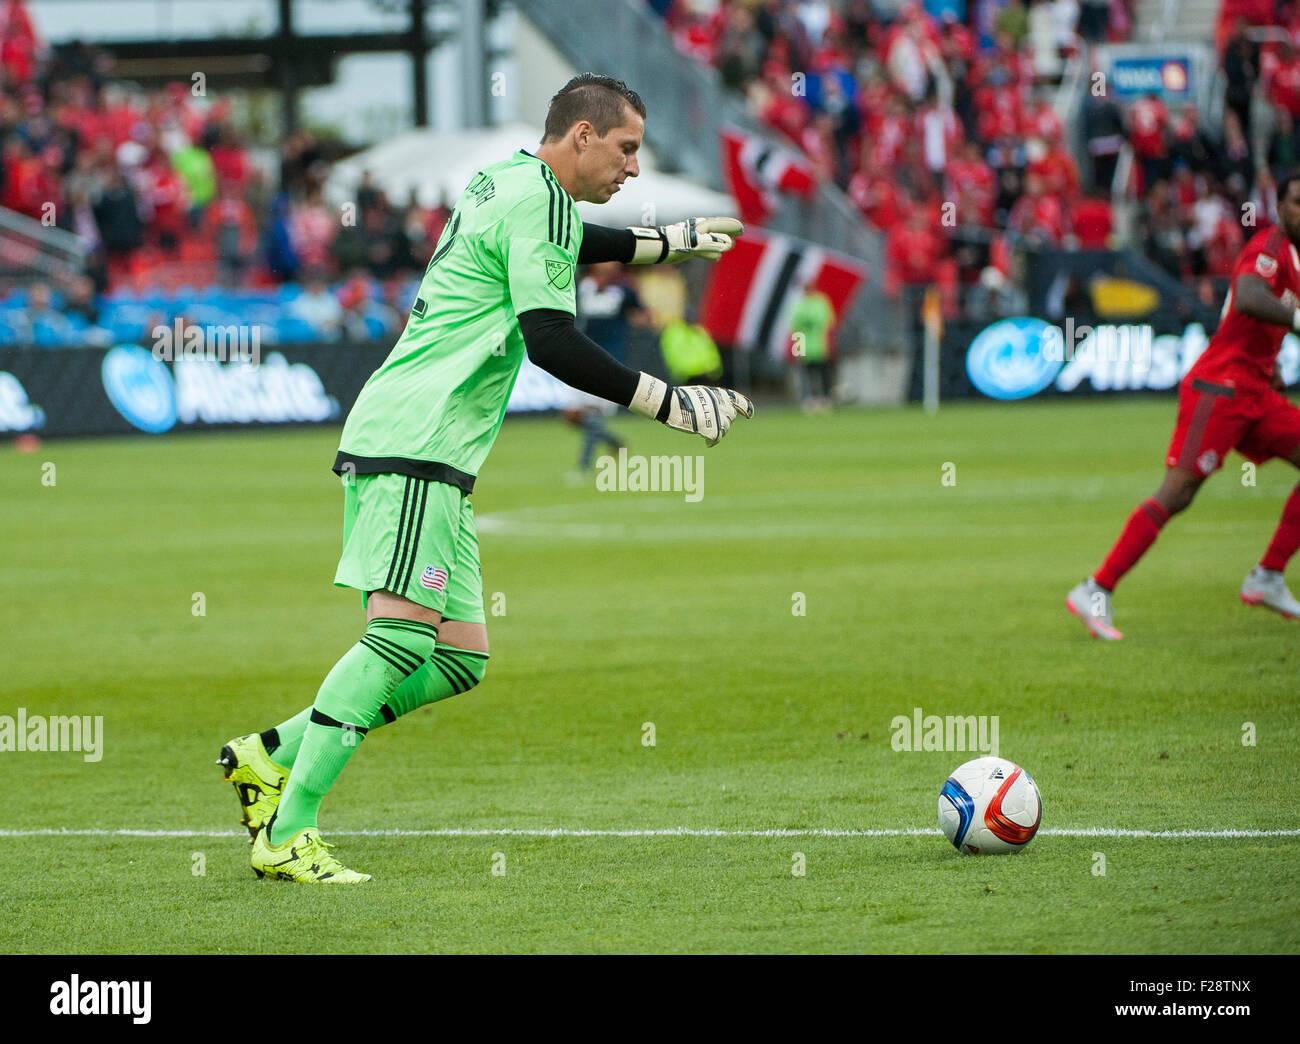 Toronto, Ontario, Canada. 13th September, 2015. New England Revolution goalkeeper Bobby Shuttleworth (22) prepares - Stock Image